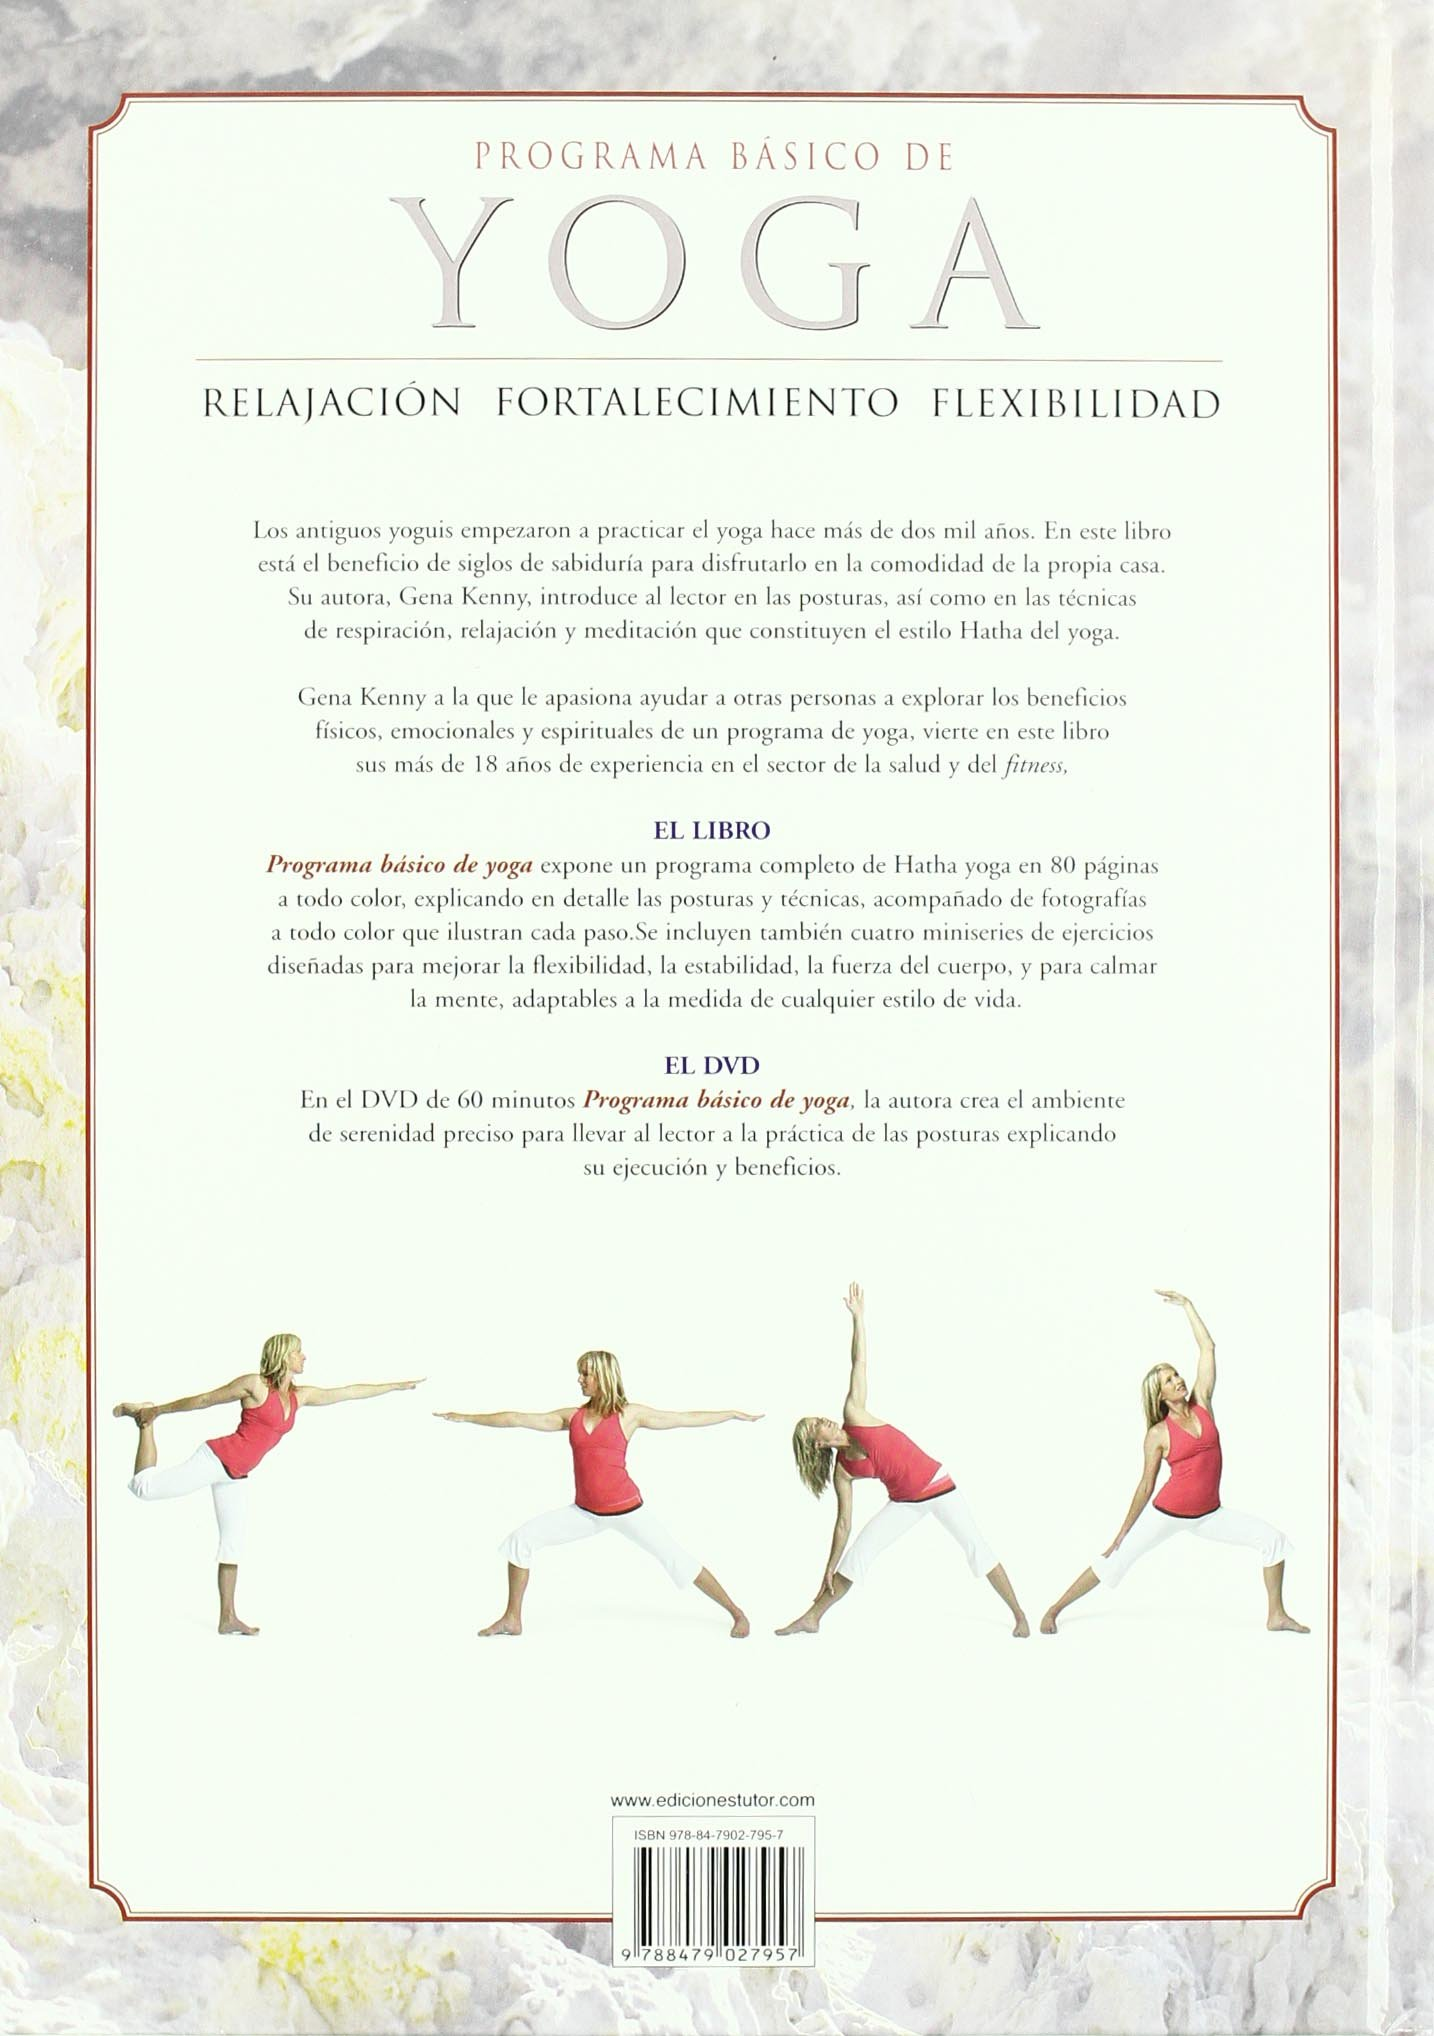 PROGRAMA BASICO DE YOGA - CON DVD (Spanish Edition): KENNY ...